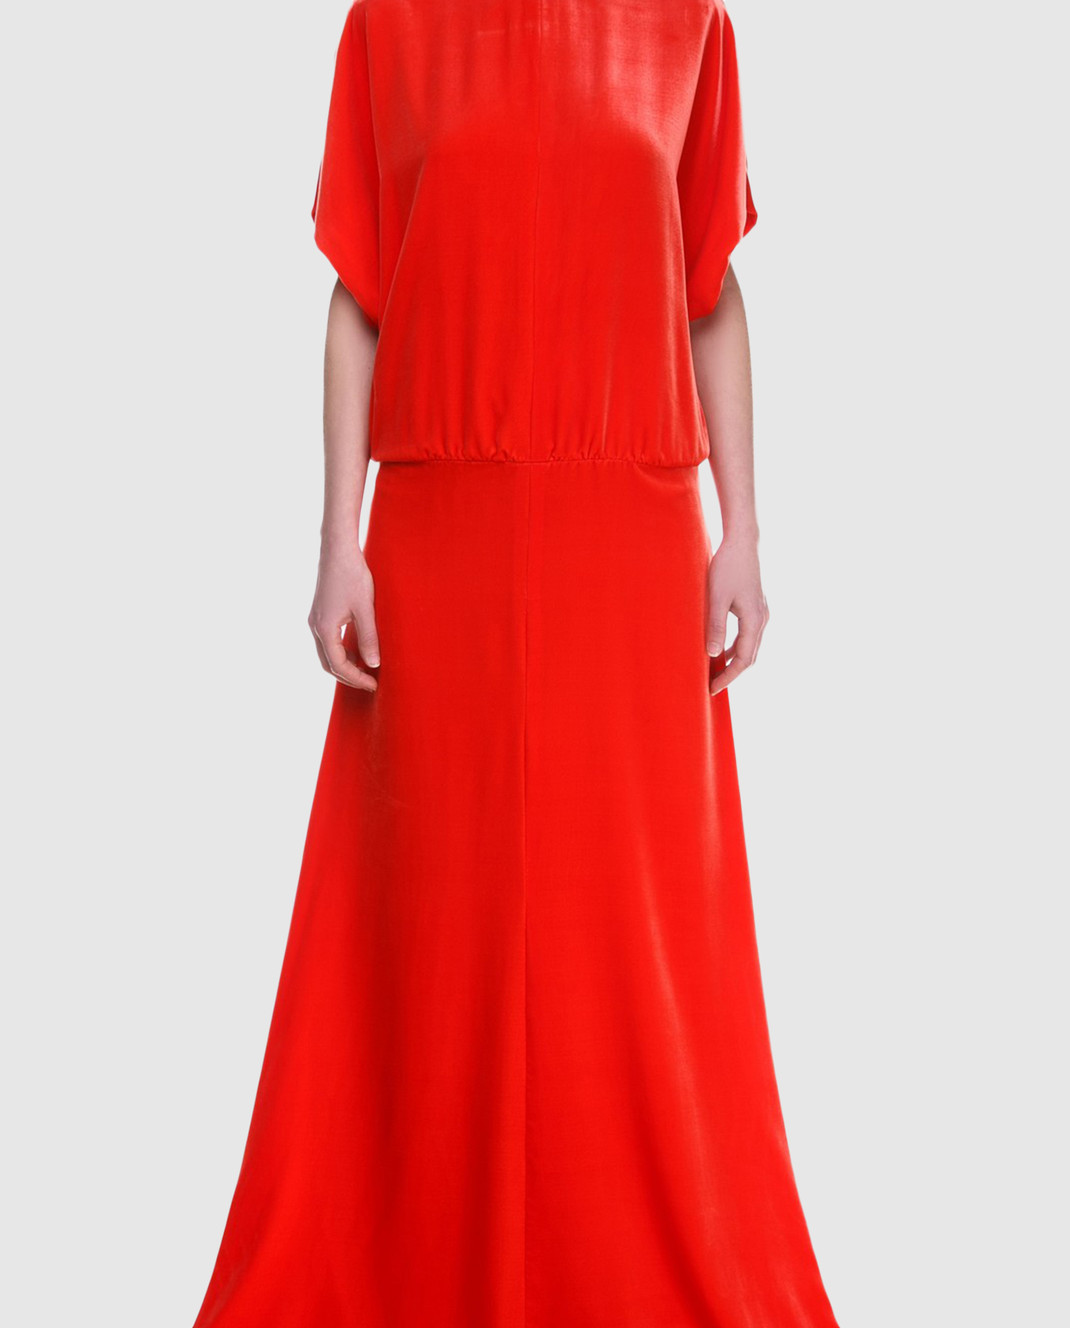 Valentino Красное платье PB0VD7E53TF изображение 3